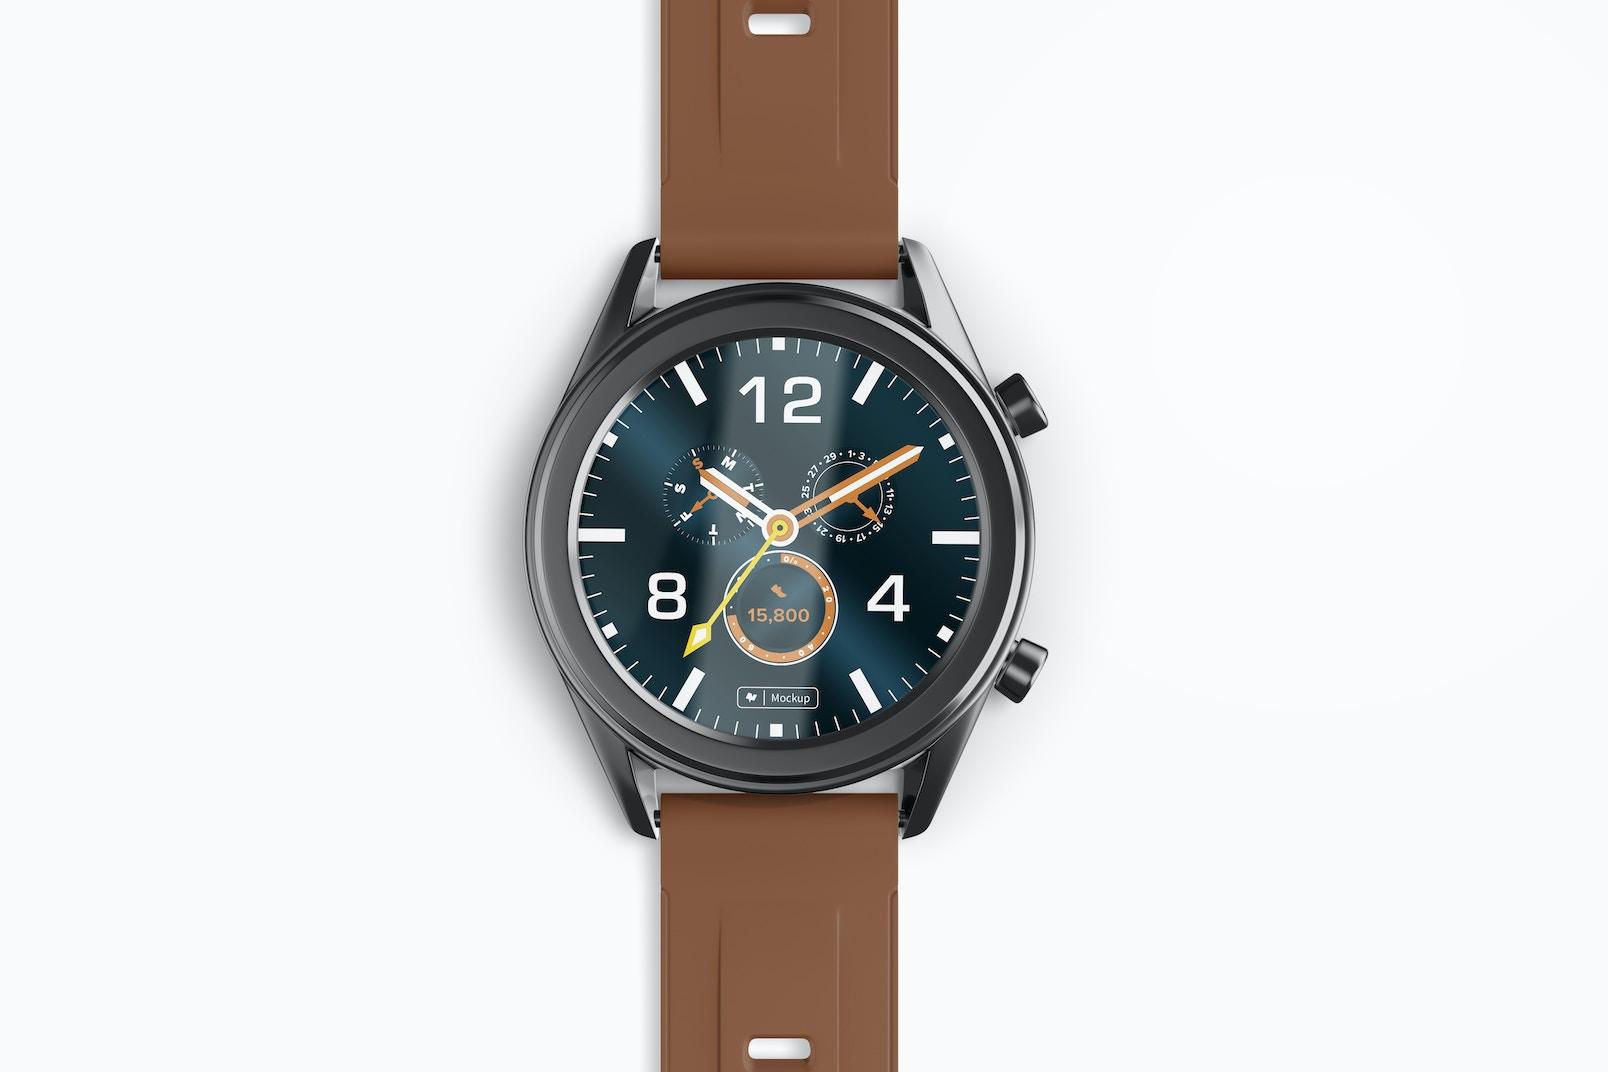 Huawei Watch GT Smartwatch Mockup, Close Up